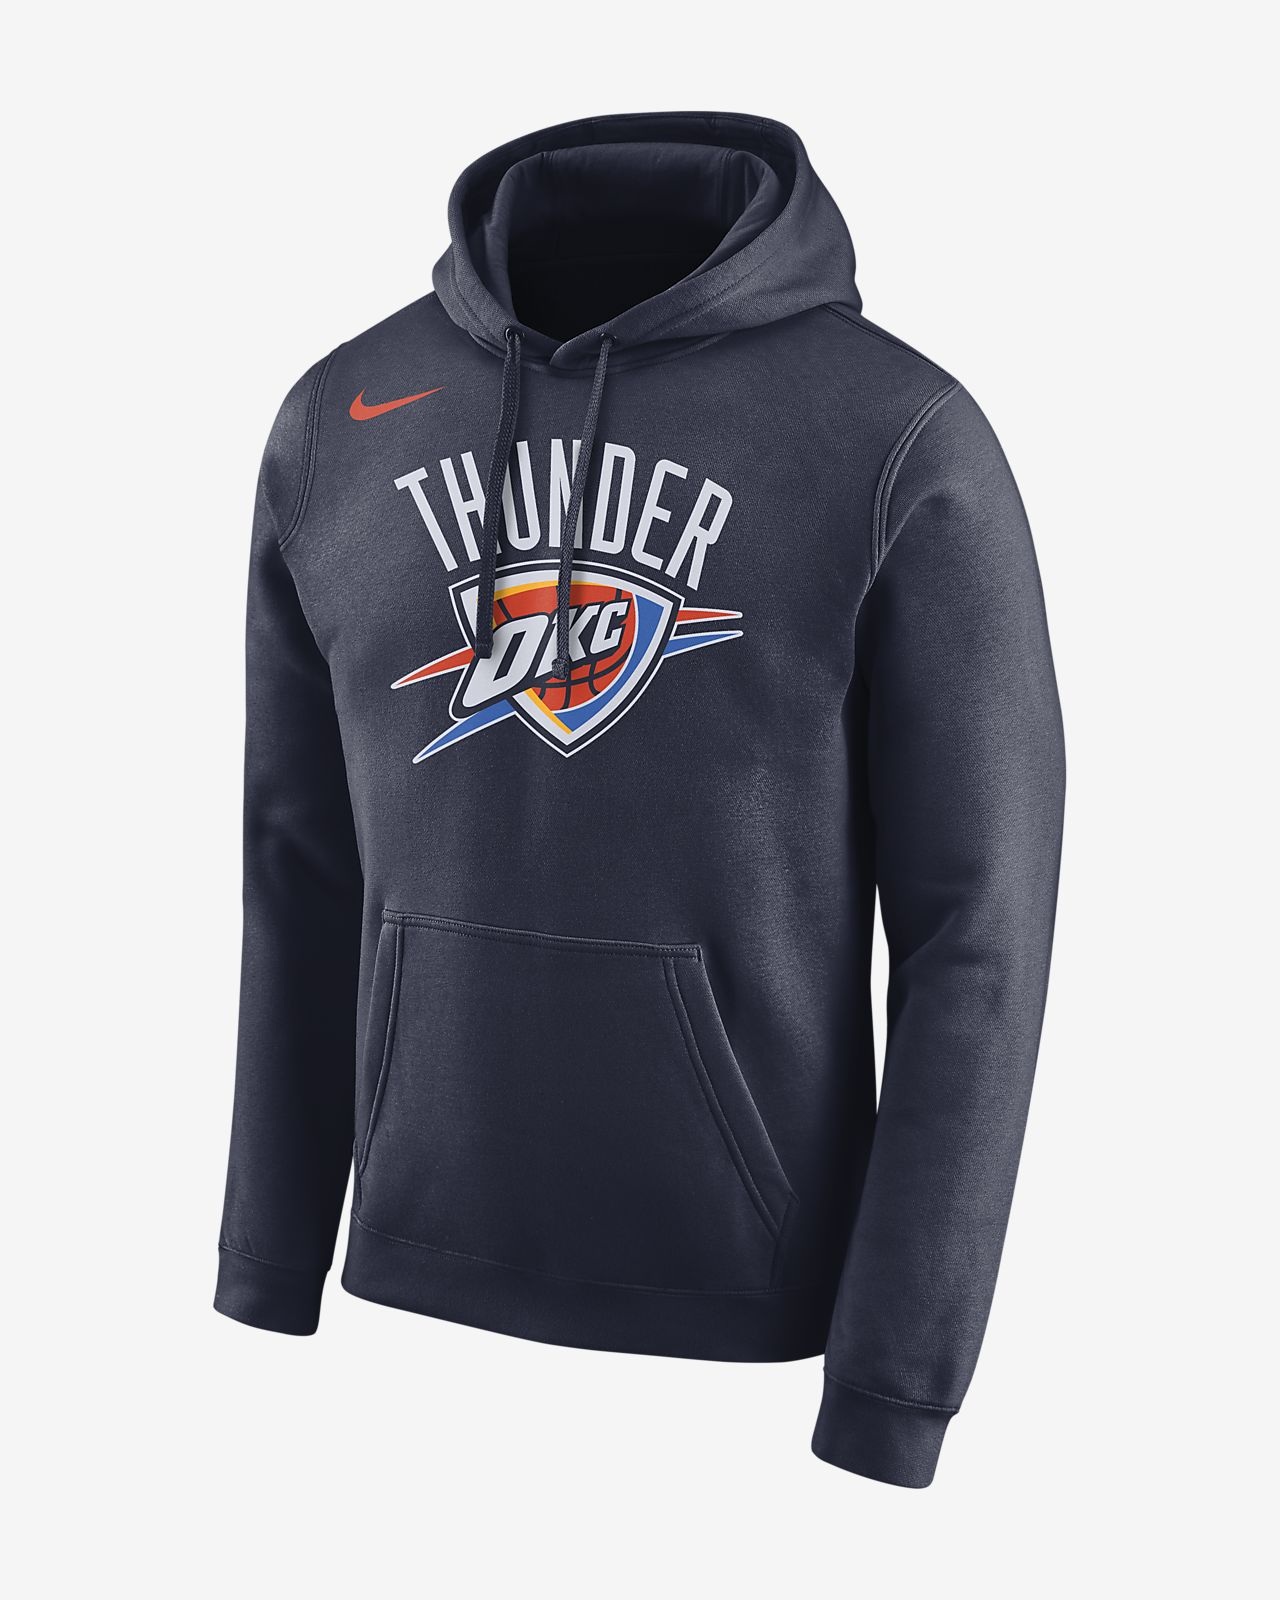 038779c33 Oklahoma City Thunder Nike Men s Logo NBA Hoodie. Nike.com EG